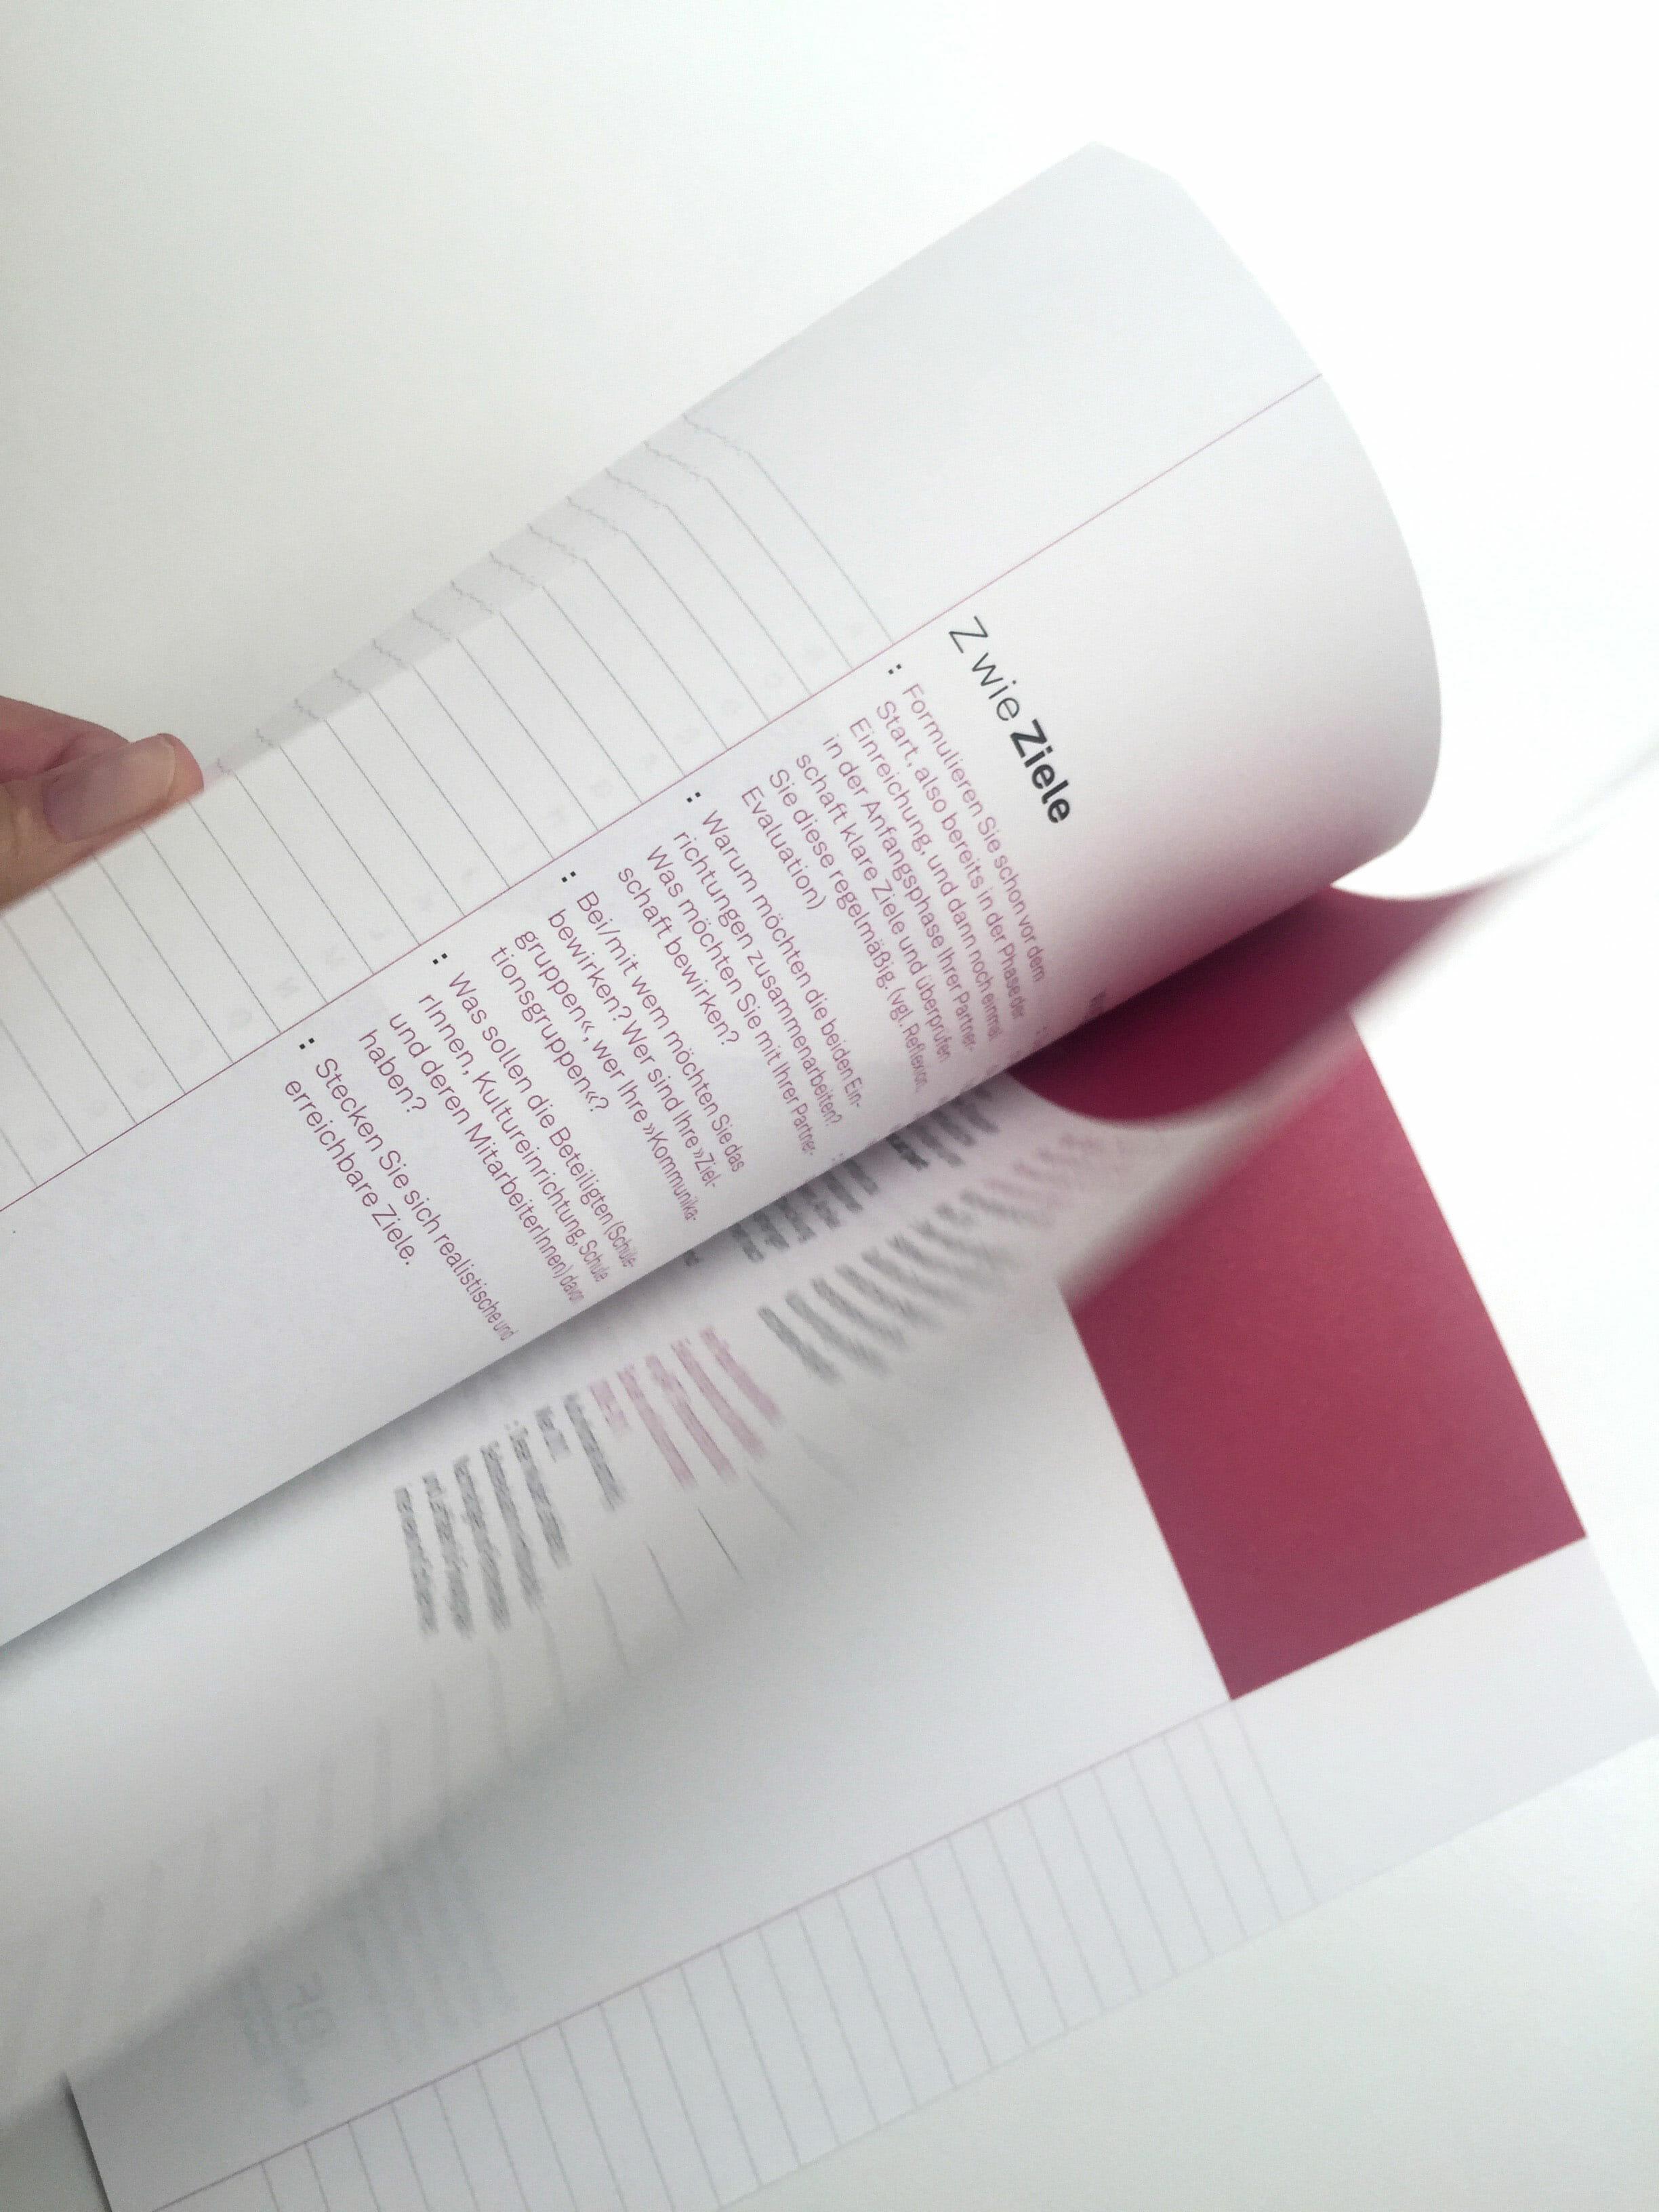 : Broschüre